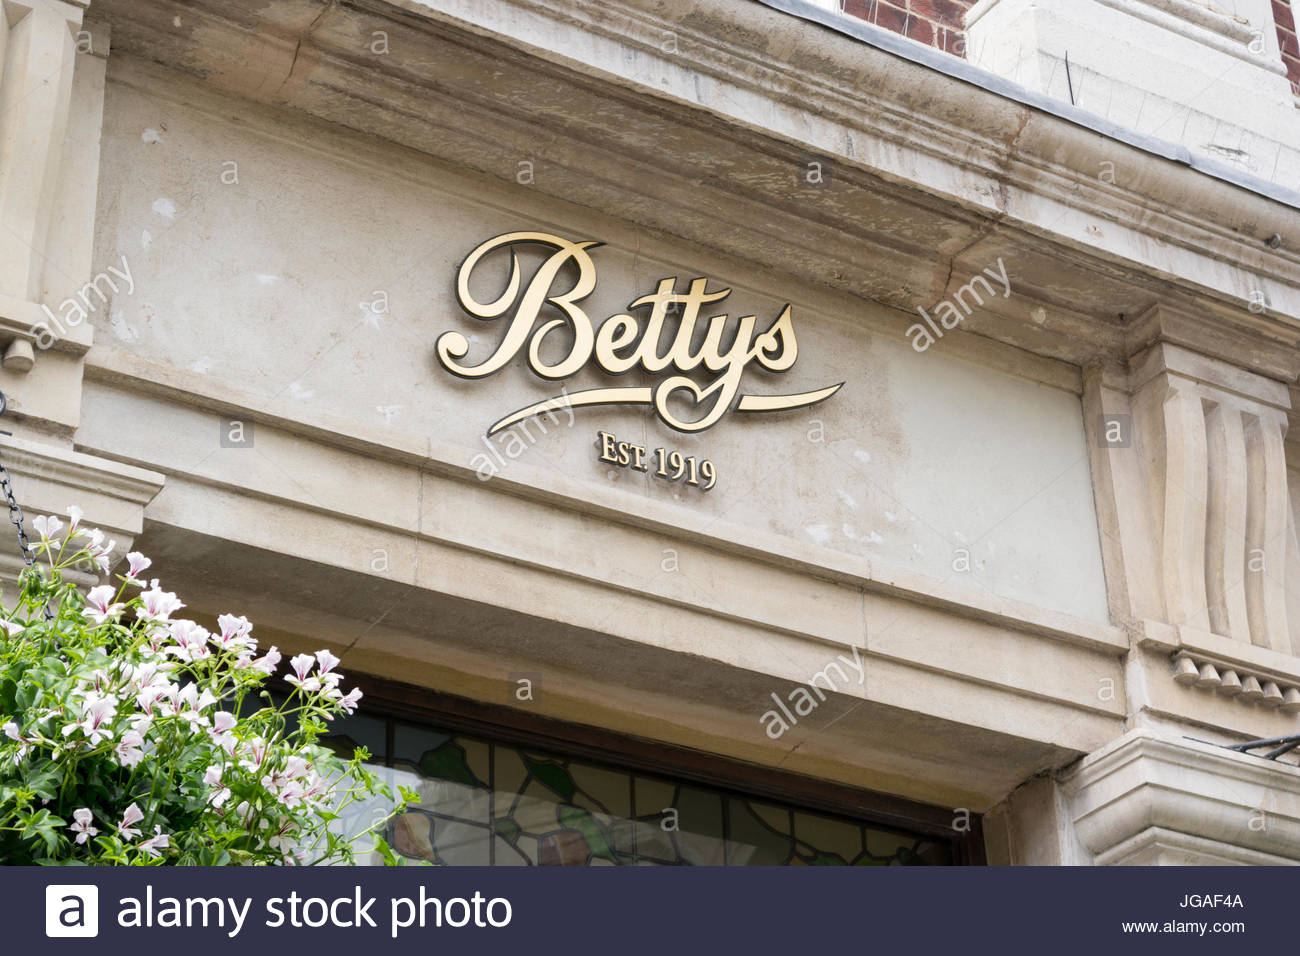 Bettys Tea Room Shop Sign, York, England, UK Stock Photo